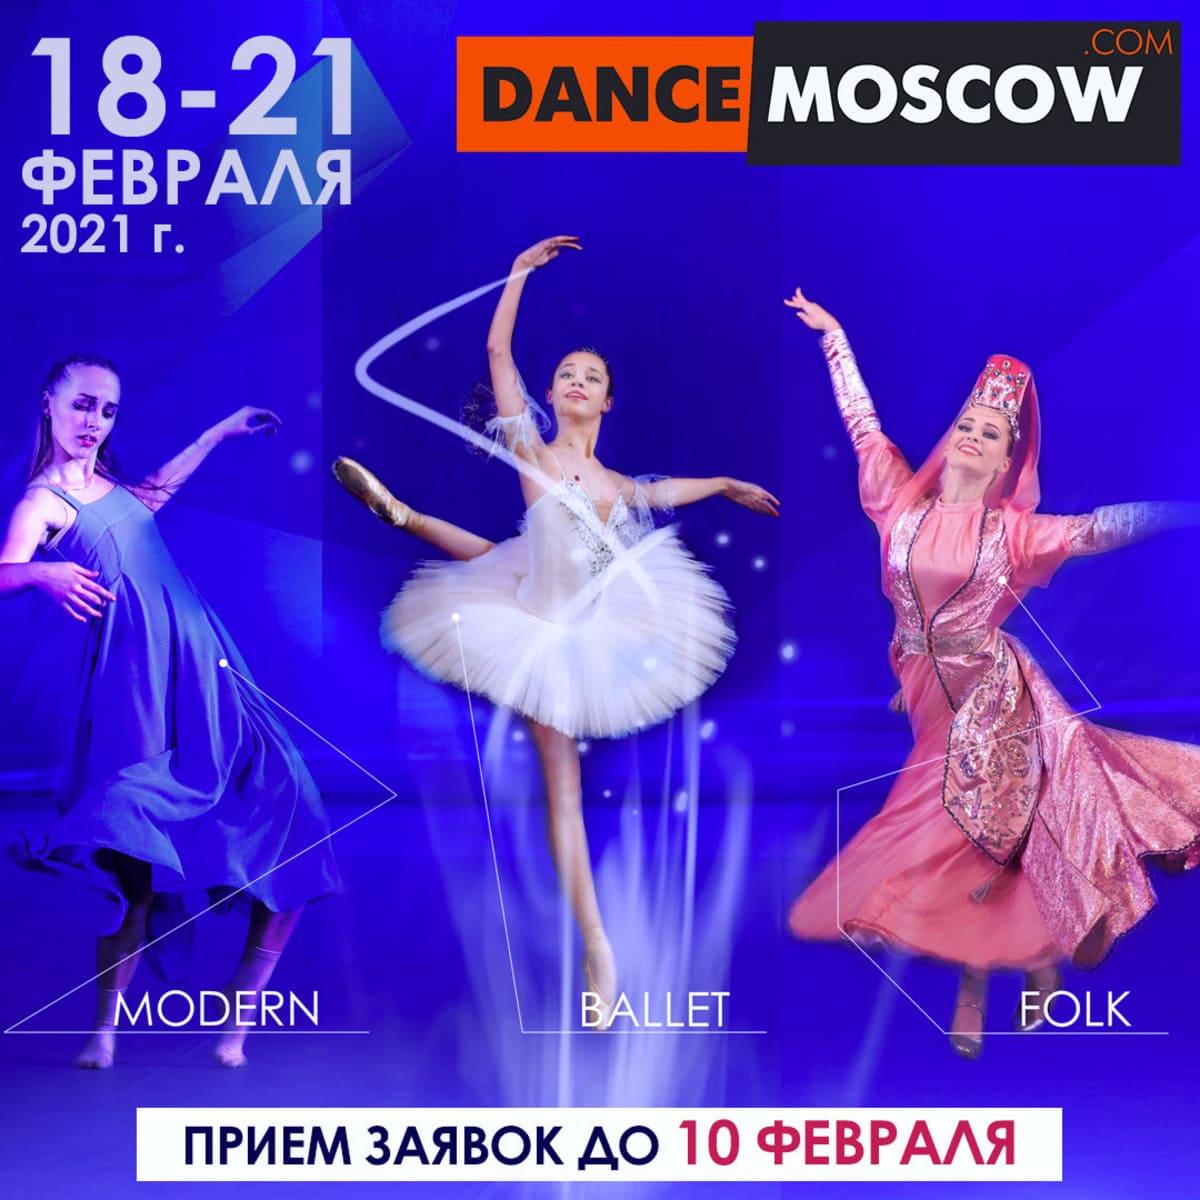 DanceMoscow